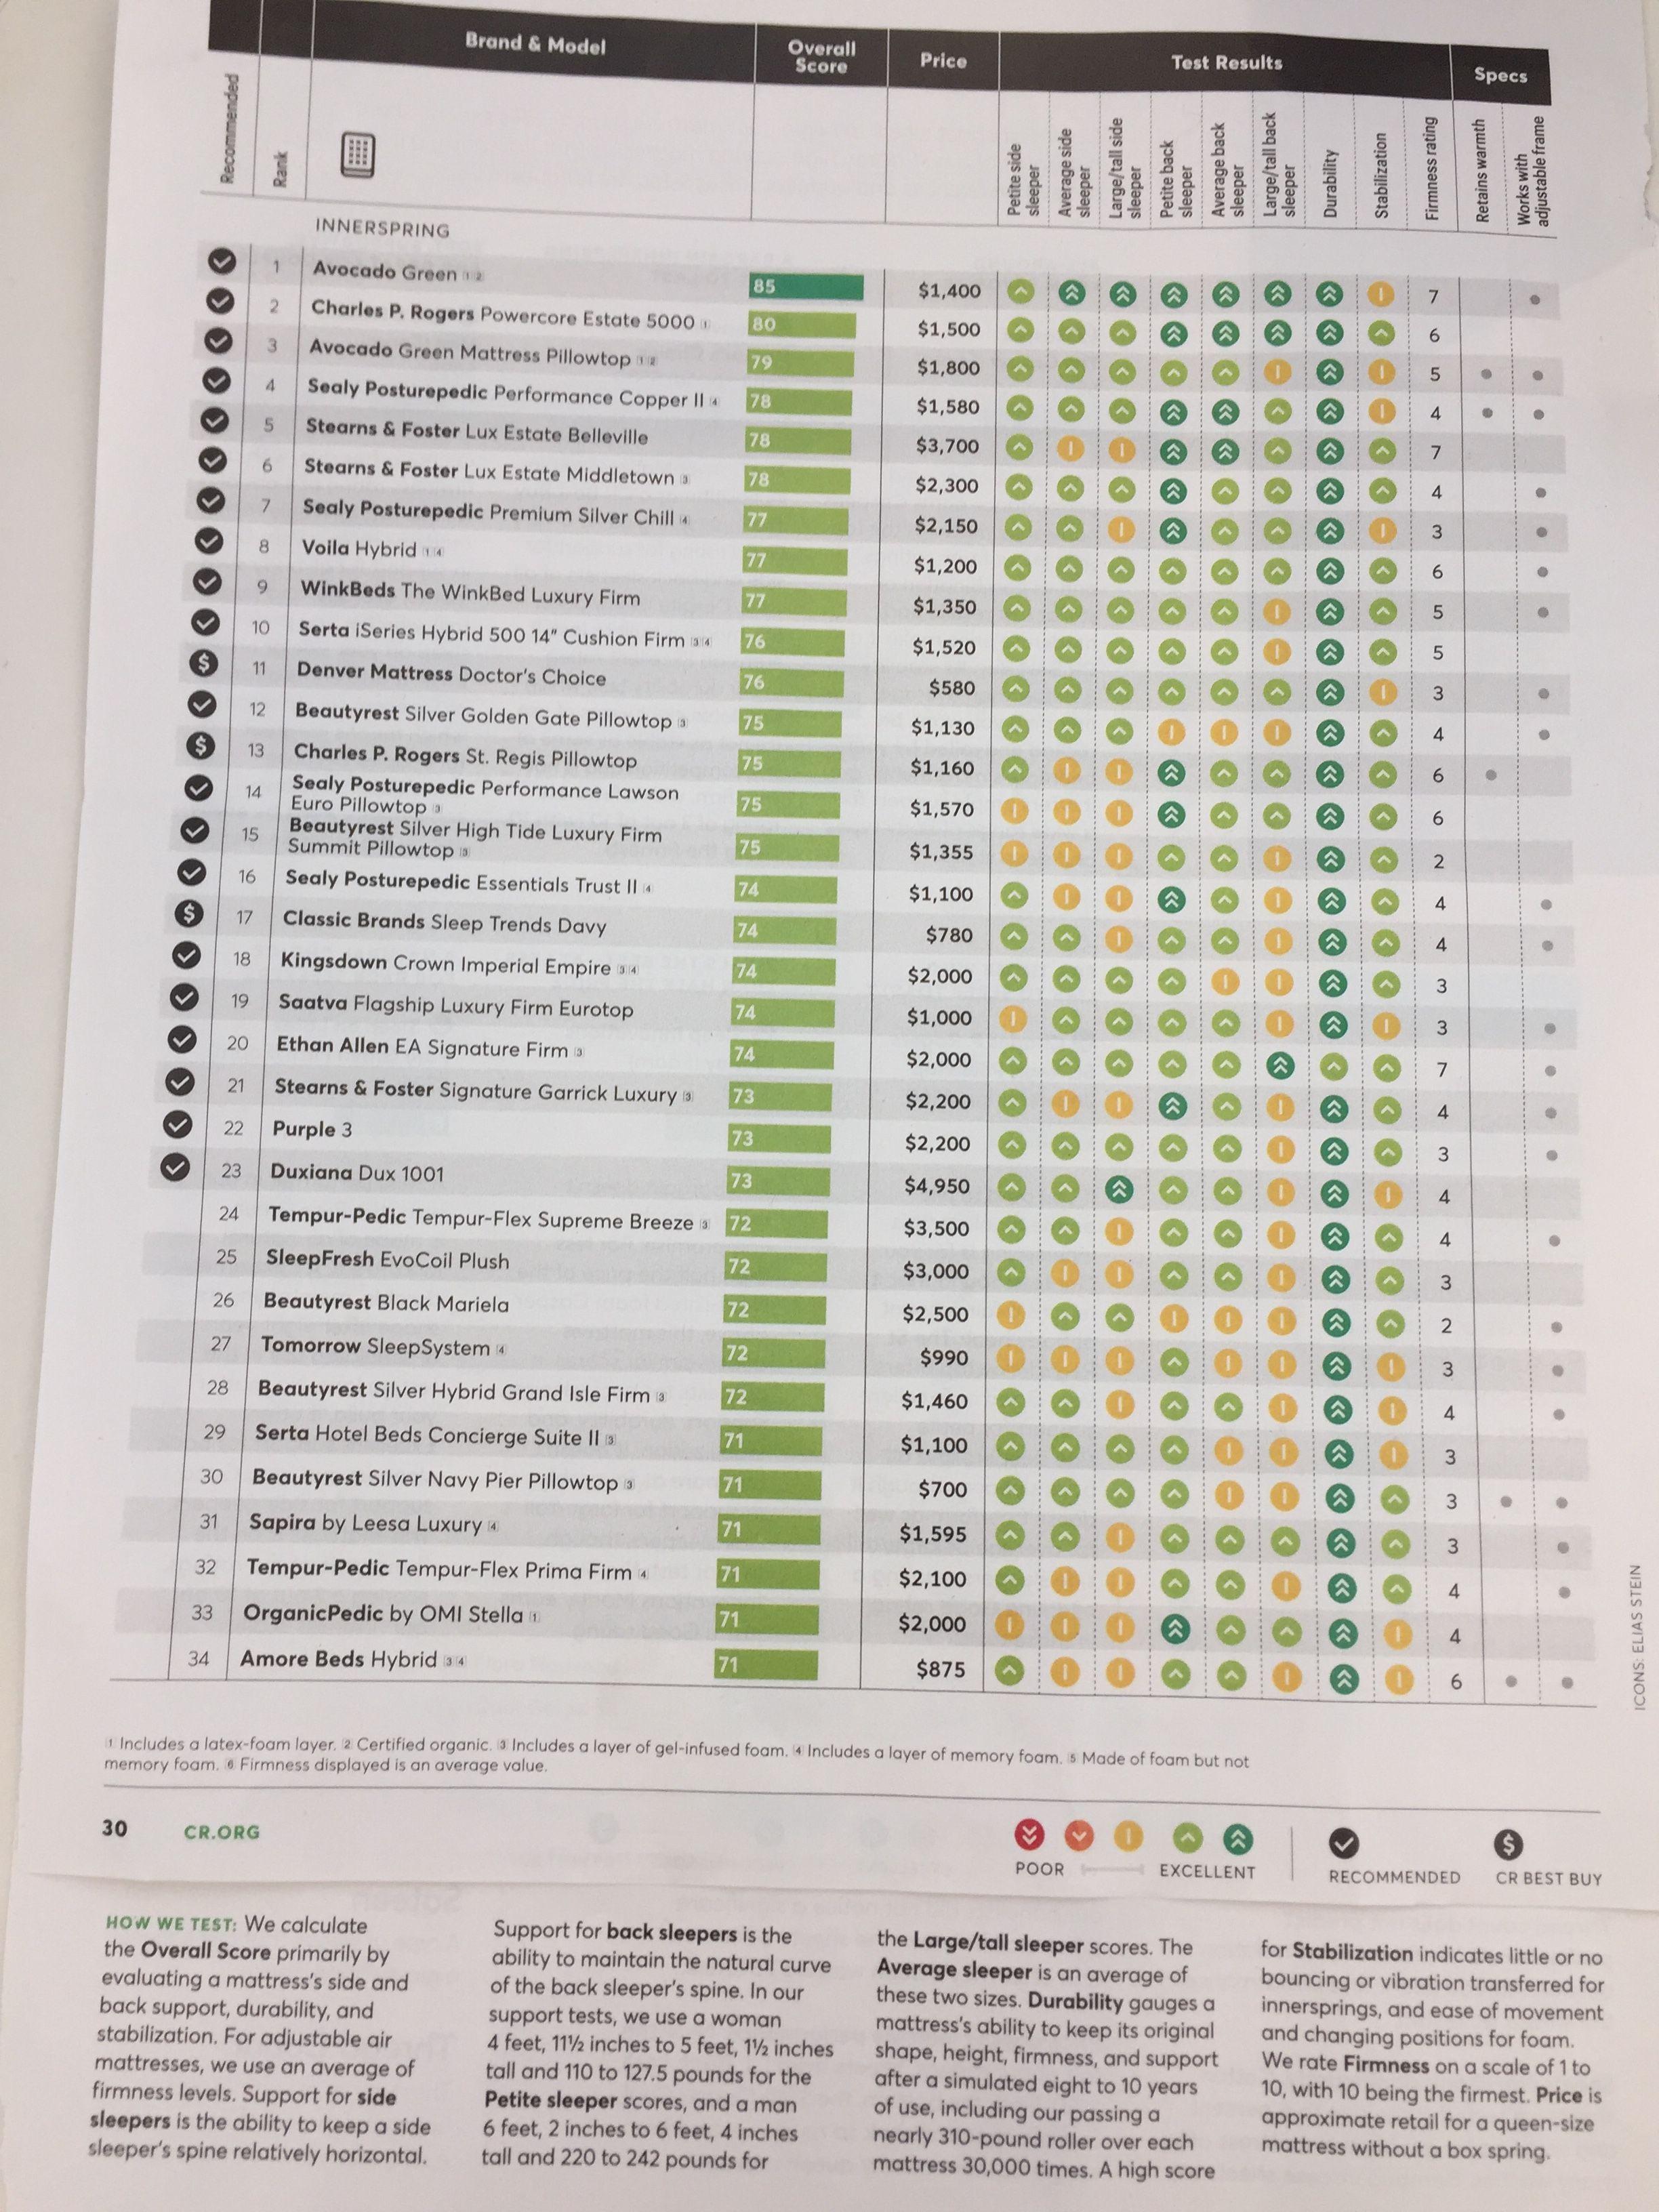 Consumer Reports Mattress Ratings Mattress Ratings Tempurpedic